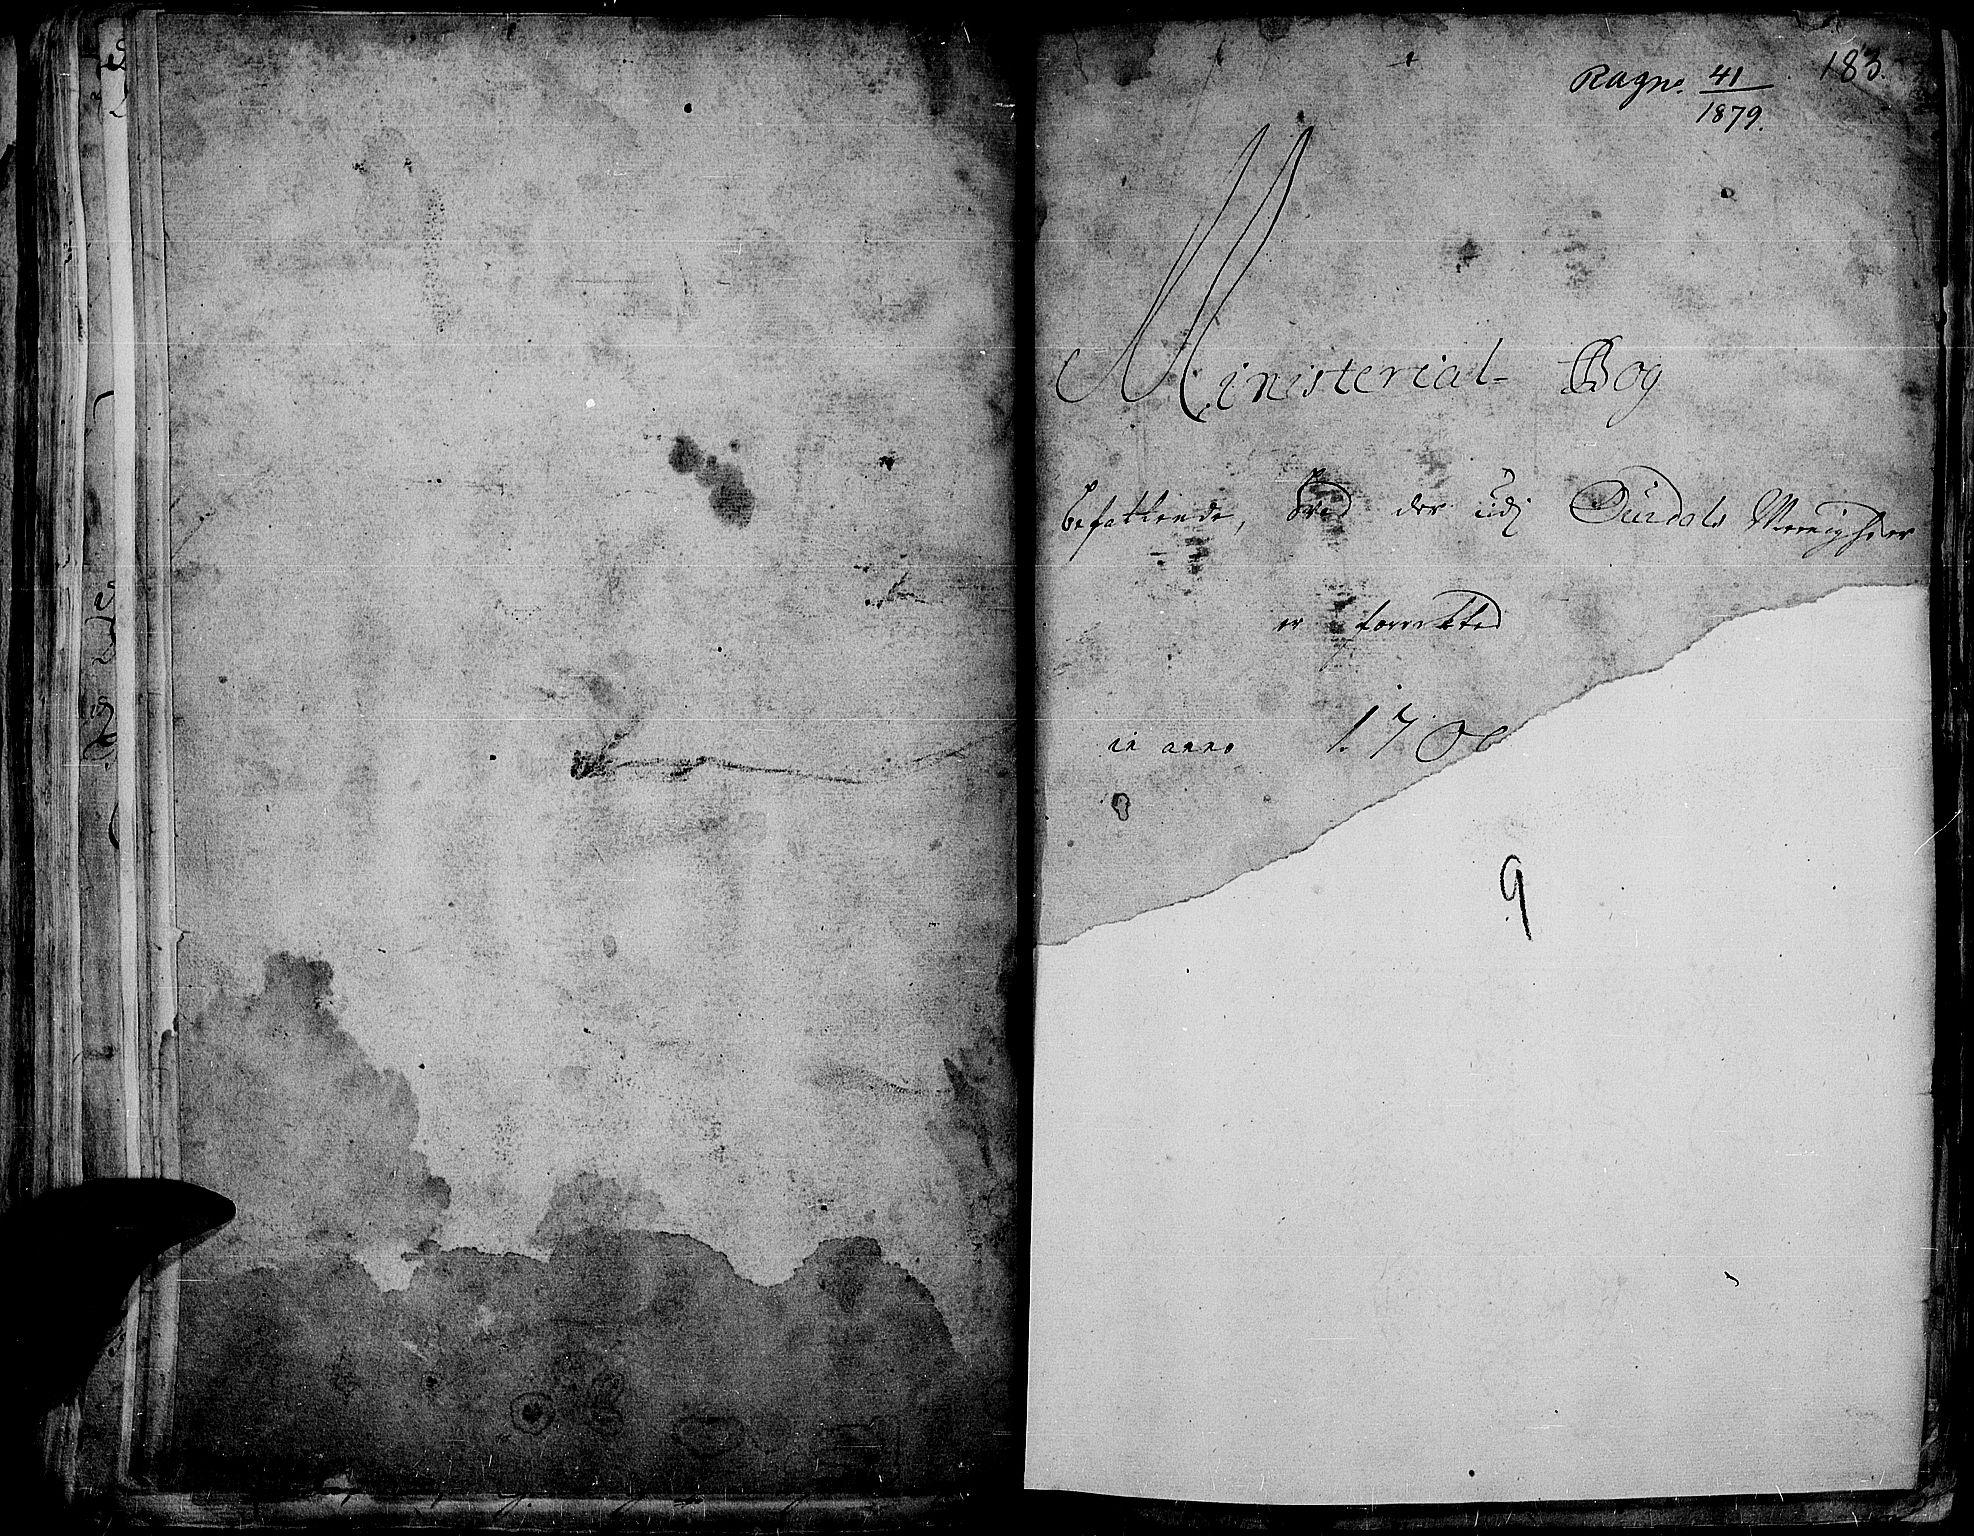 SAH, Aurdal prestekontor, Ministerialbok nr. 1-3, 1692-1730, s. 183